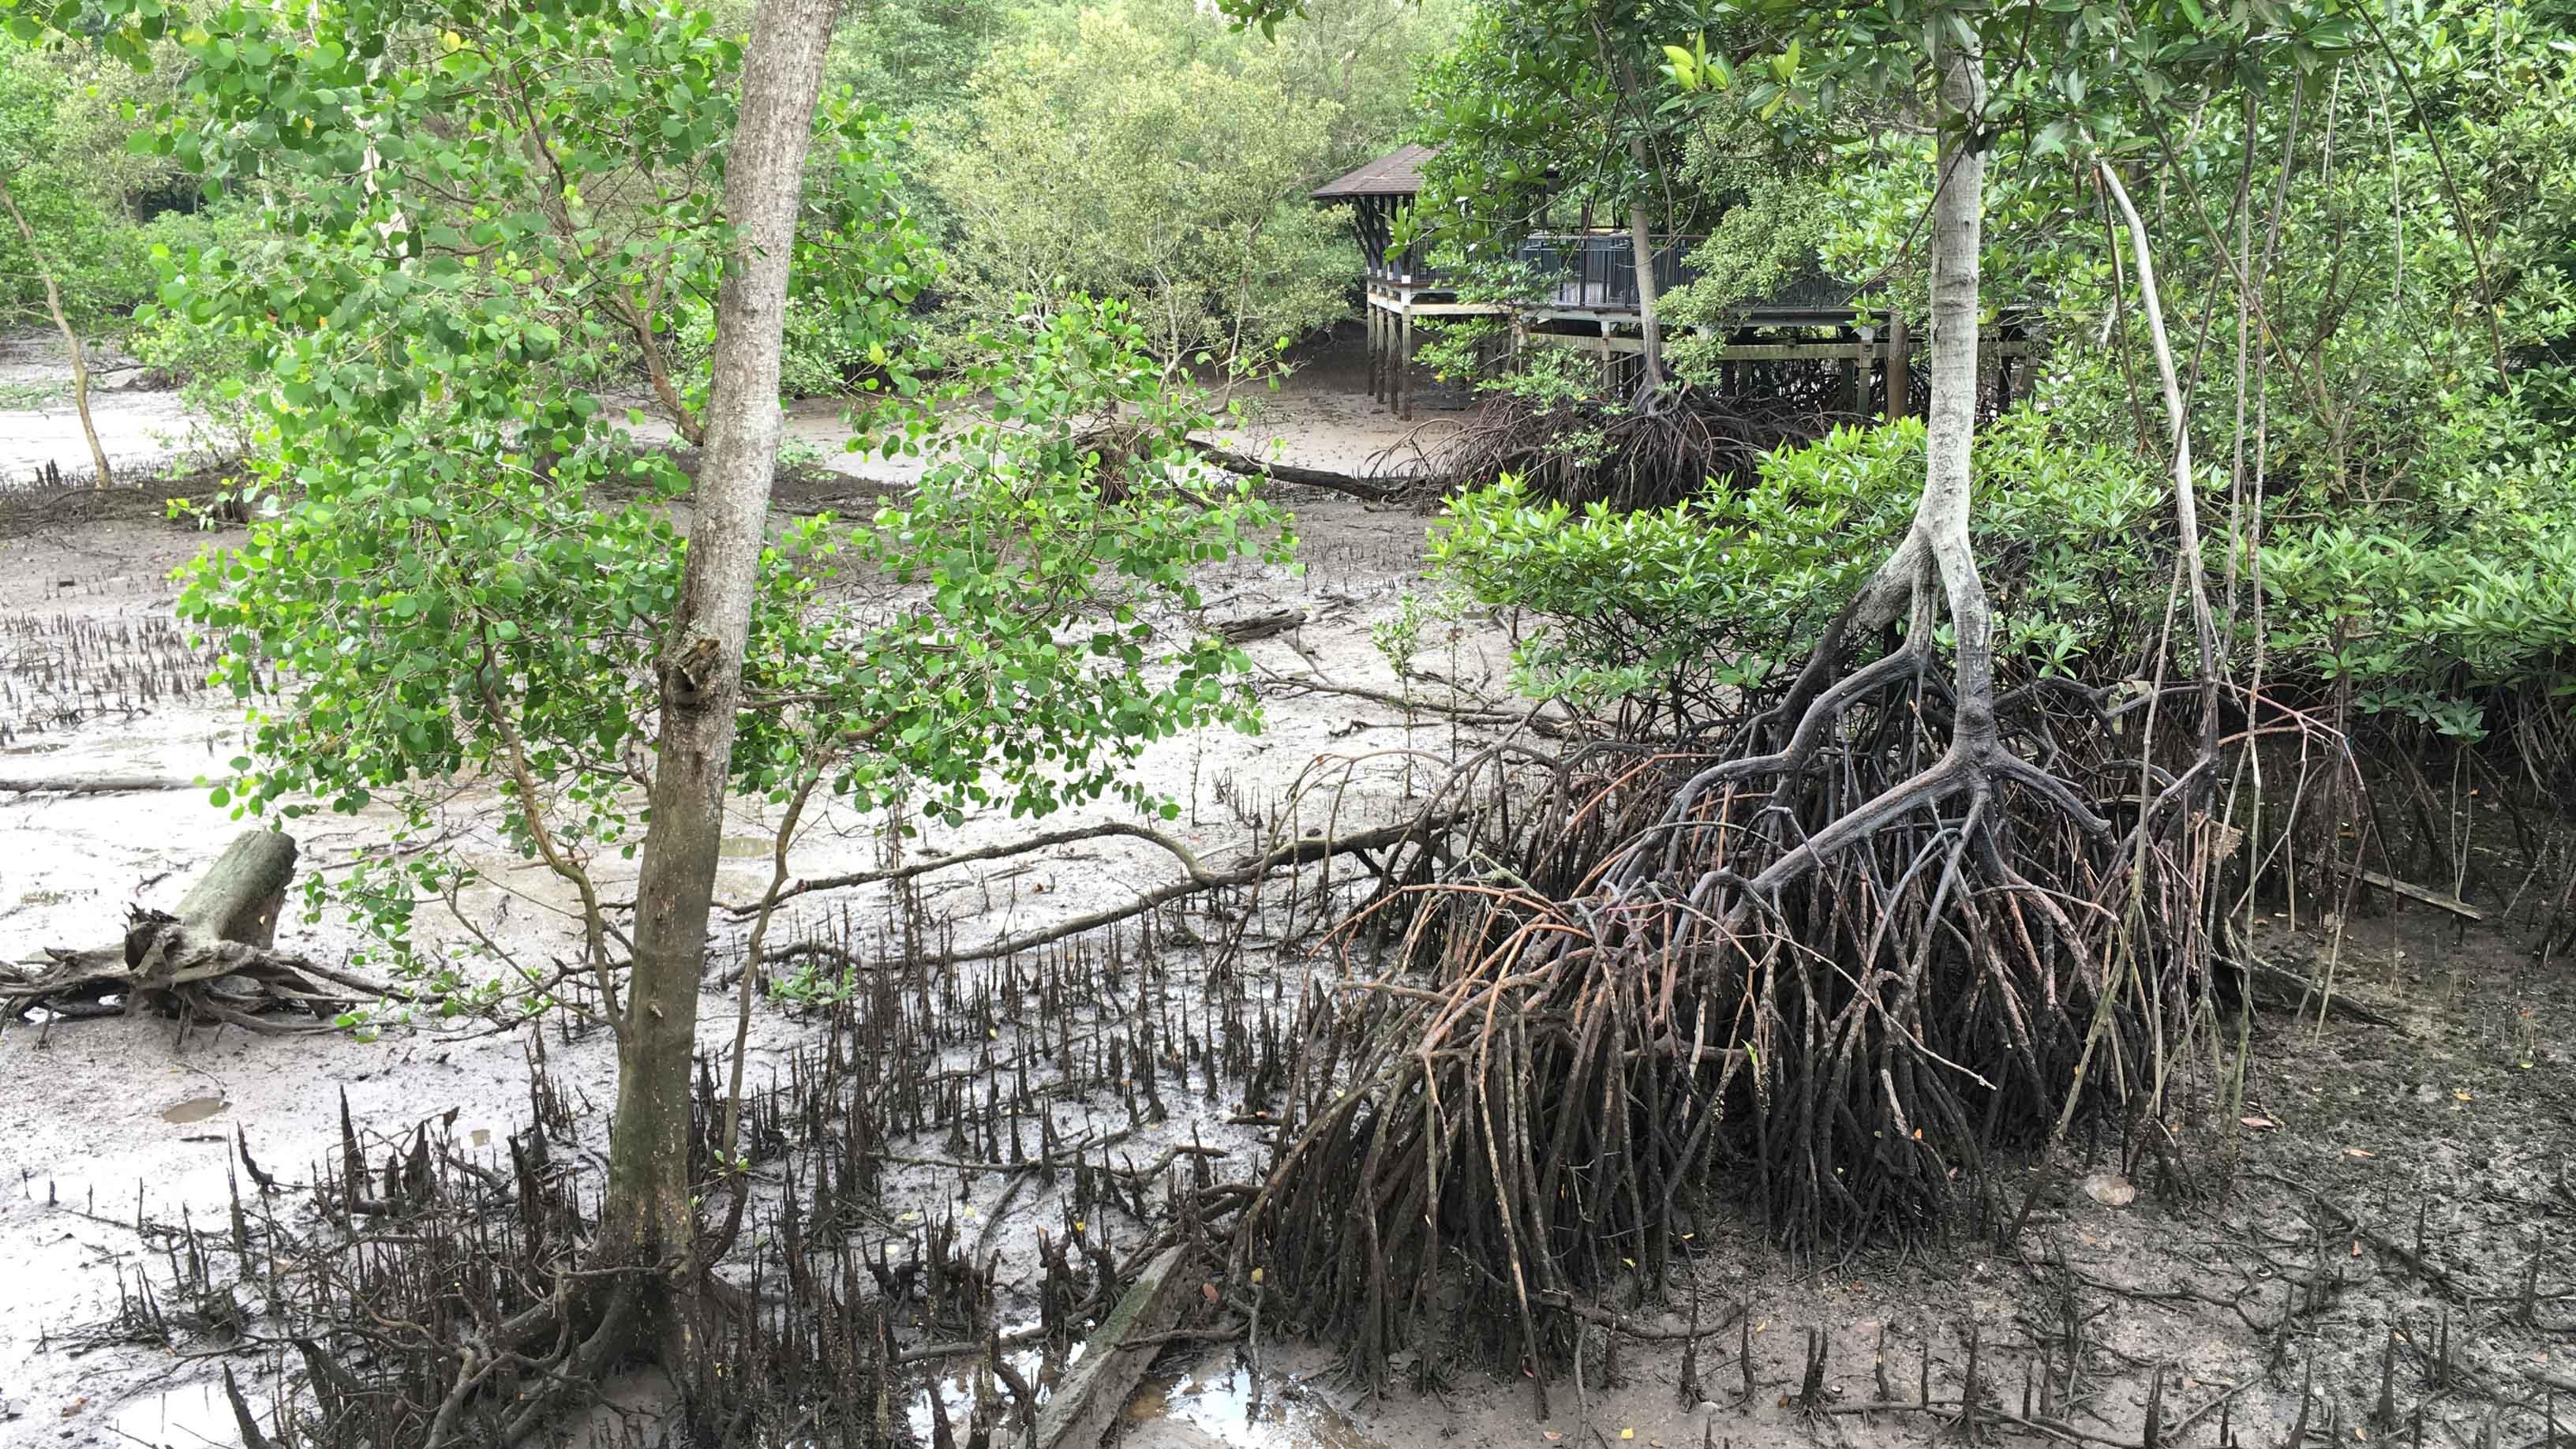 sungei buloh wetland reserve parks nature reserves gardens